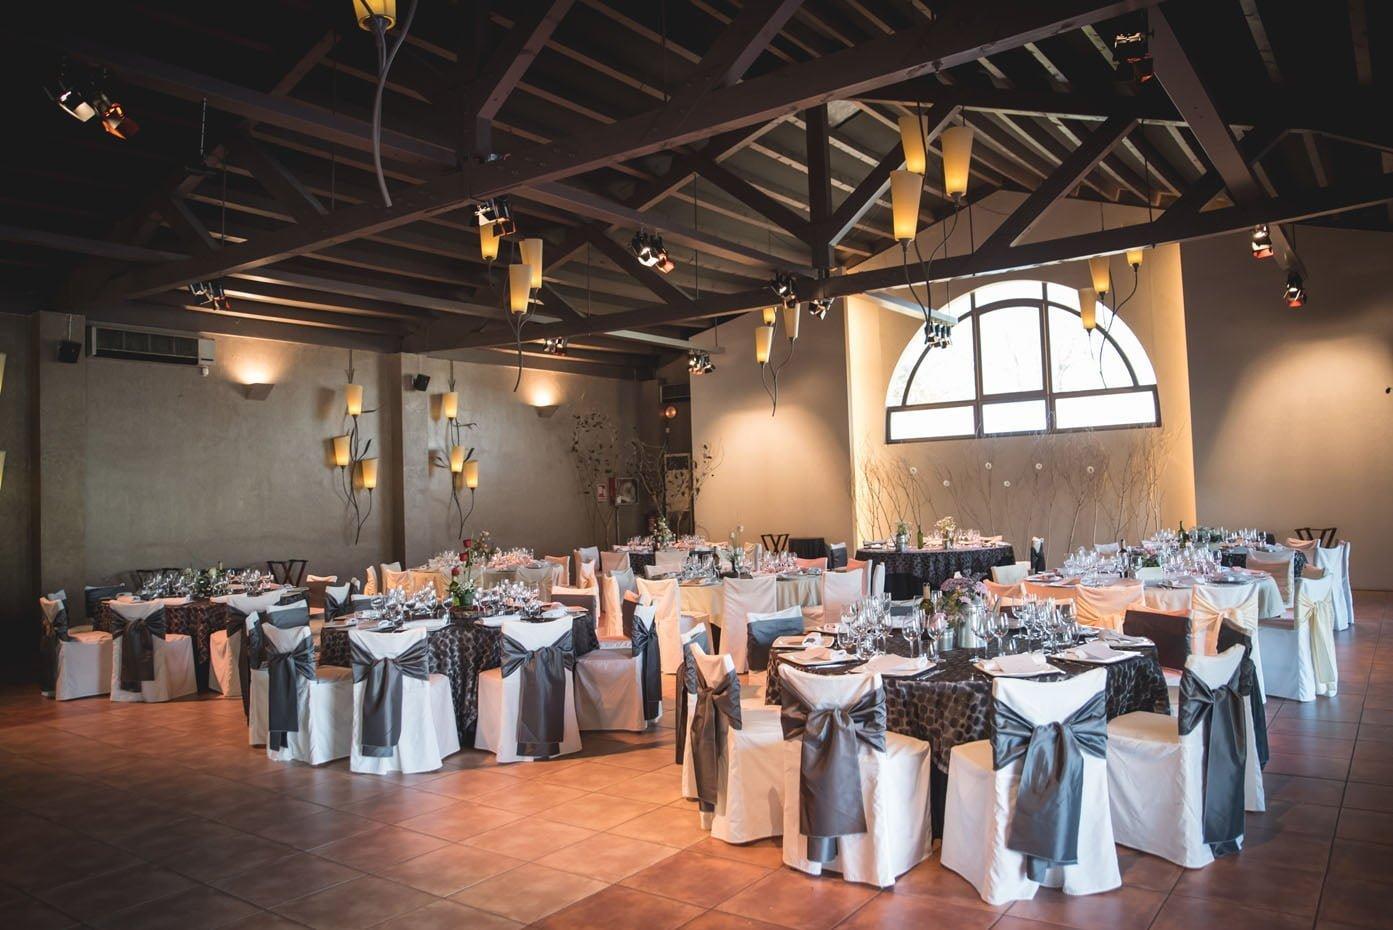 Casament-can-macia-espai-gastronomia30